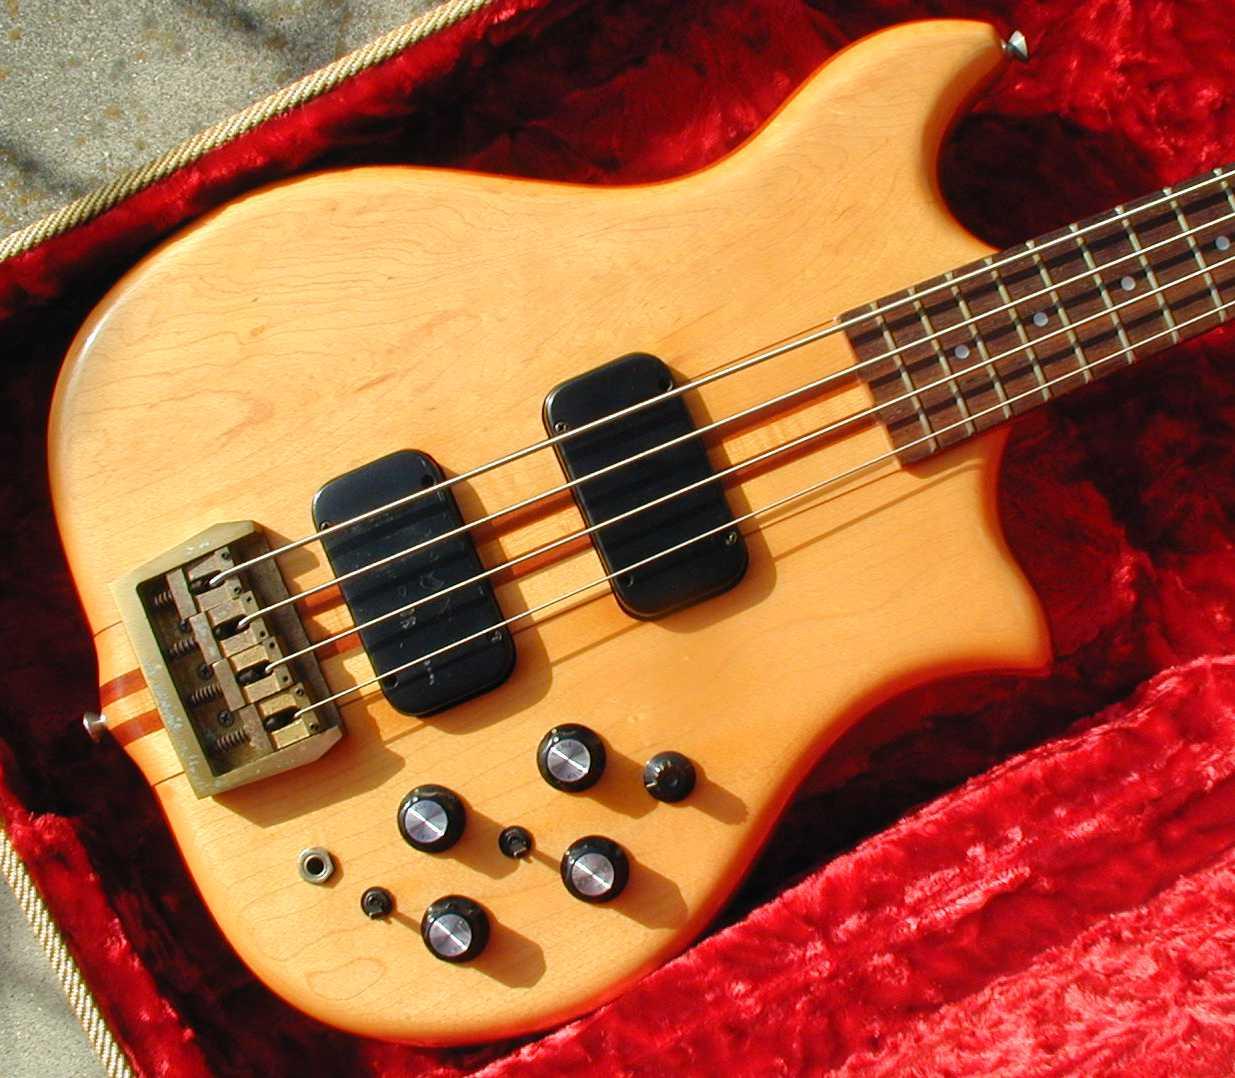 1979 kawai f1 alembic bass guitar replica. Black Bedroom Furniture Sets. Home Design Ideas